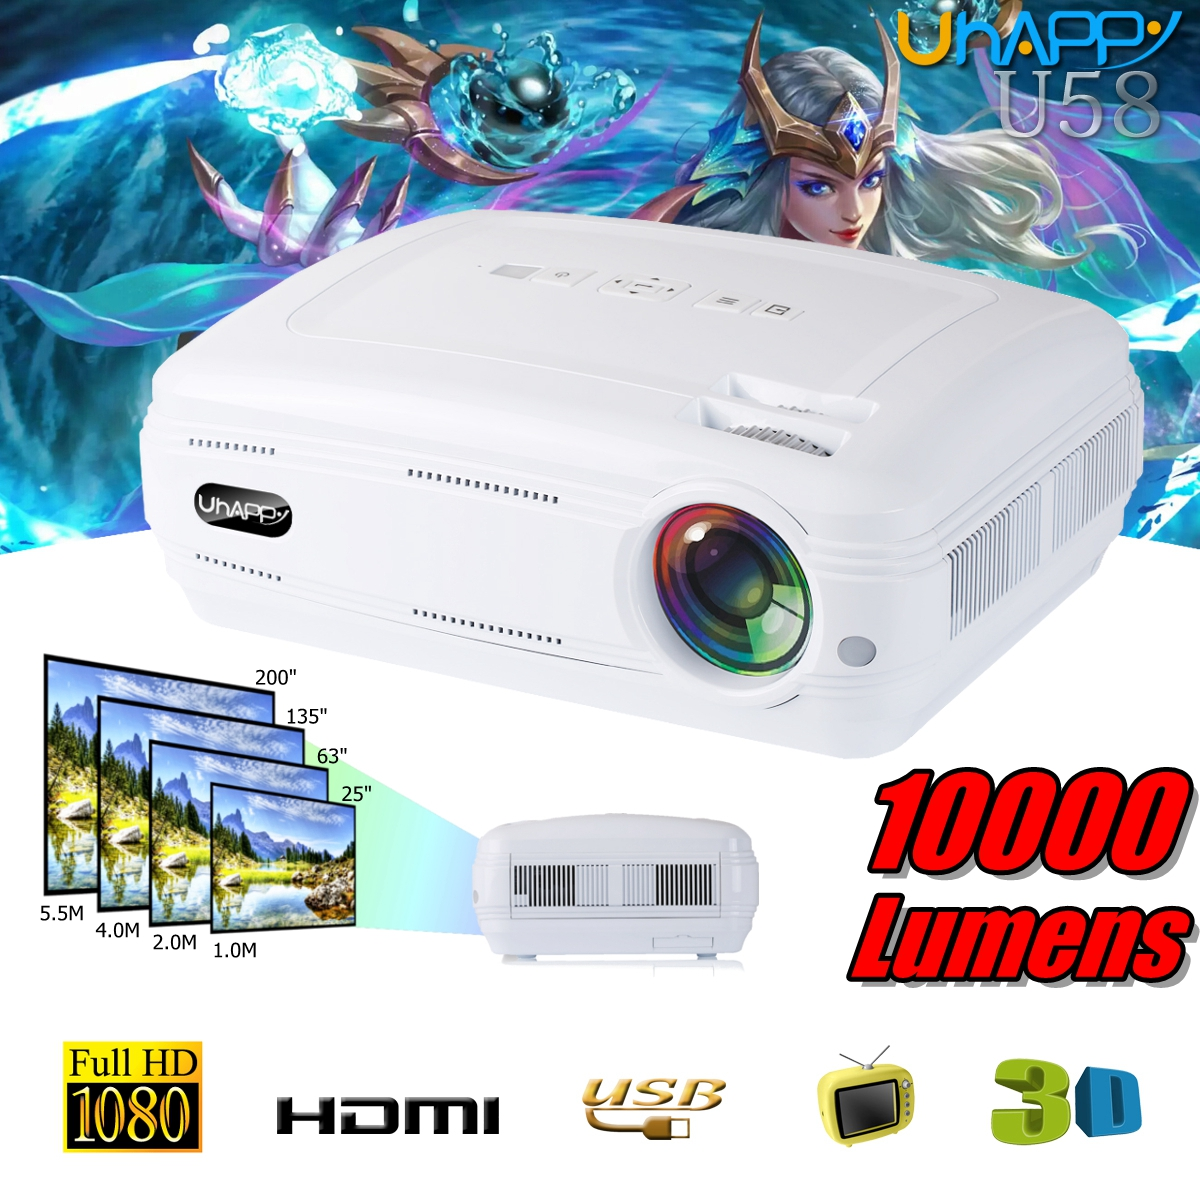 10000 Lumens 1080 p 3D LED Home Cinéma Théâtre Projecteur TV/AV/VGA/HD Multimédia Beamer